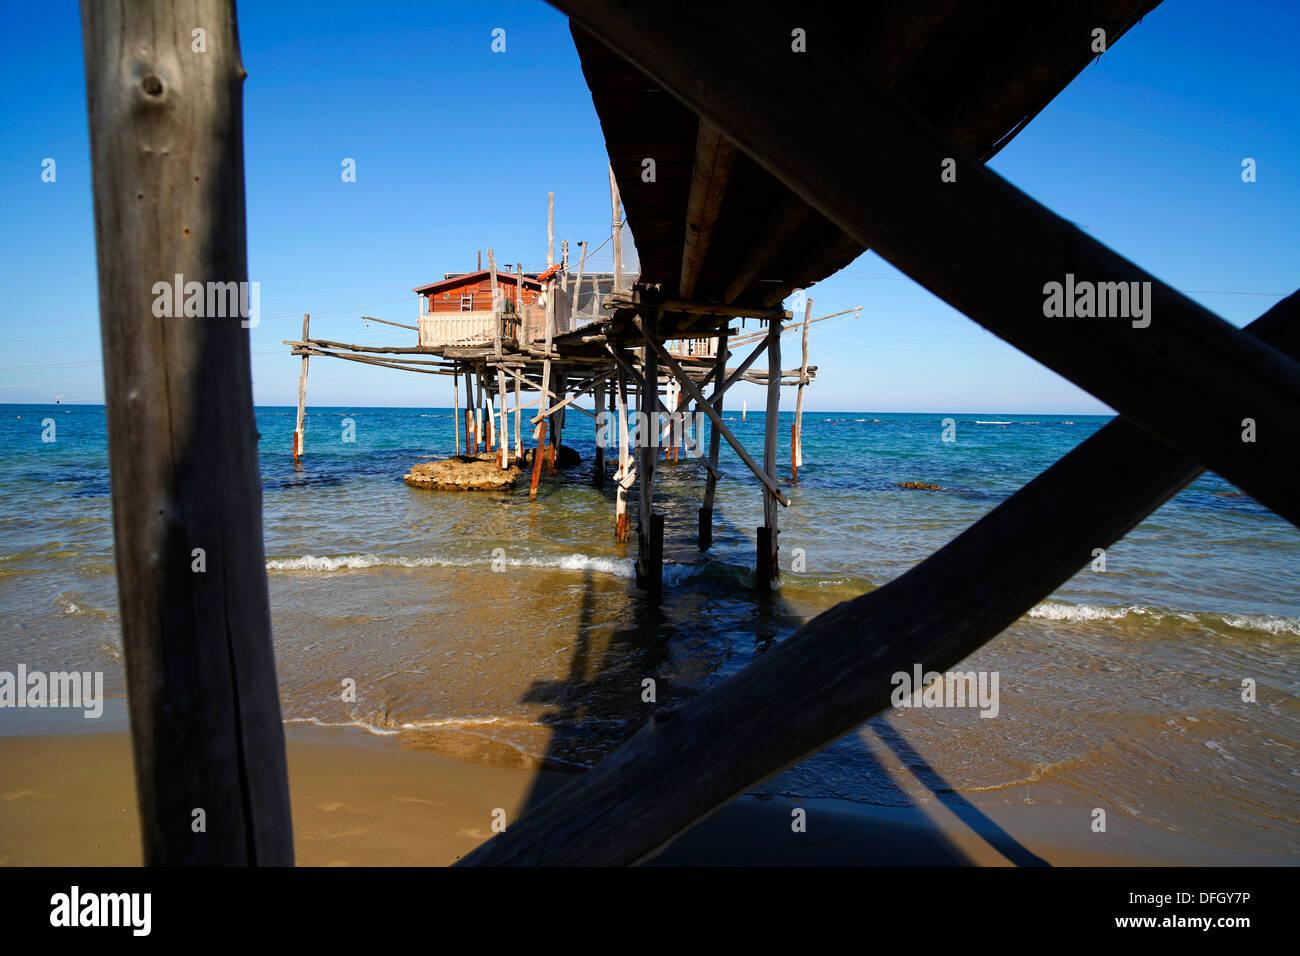 A fisherman's trabiocci on the Adriatic coast near Vasto in Italy. - Stock Image